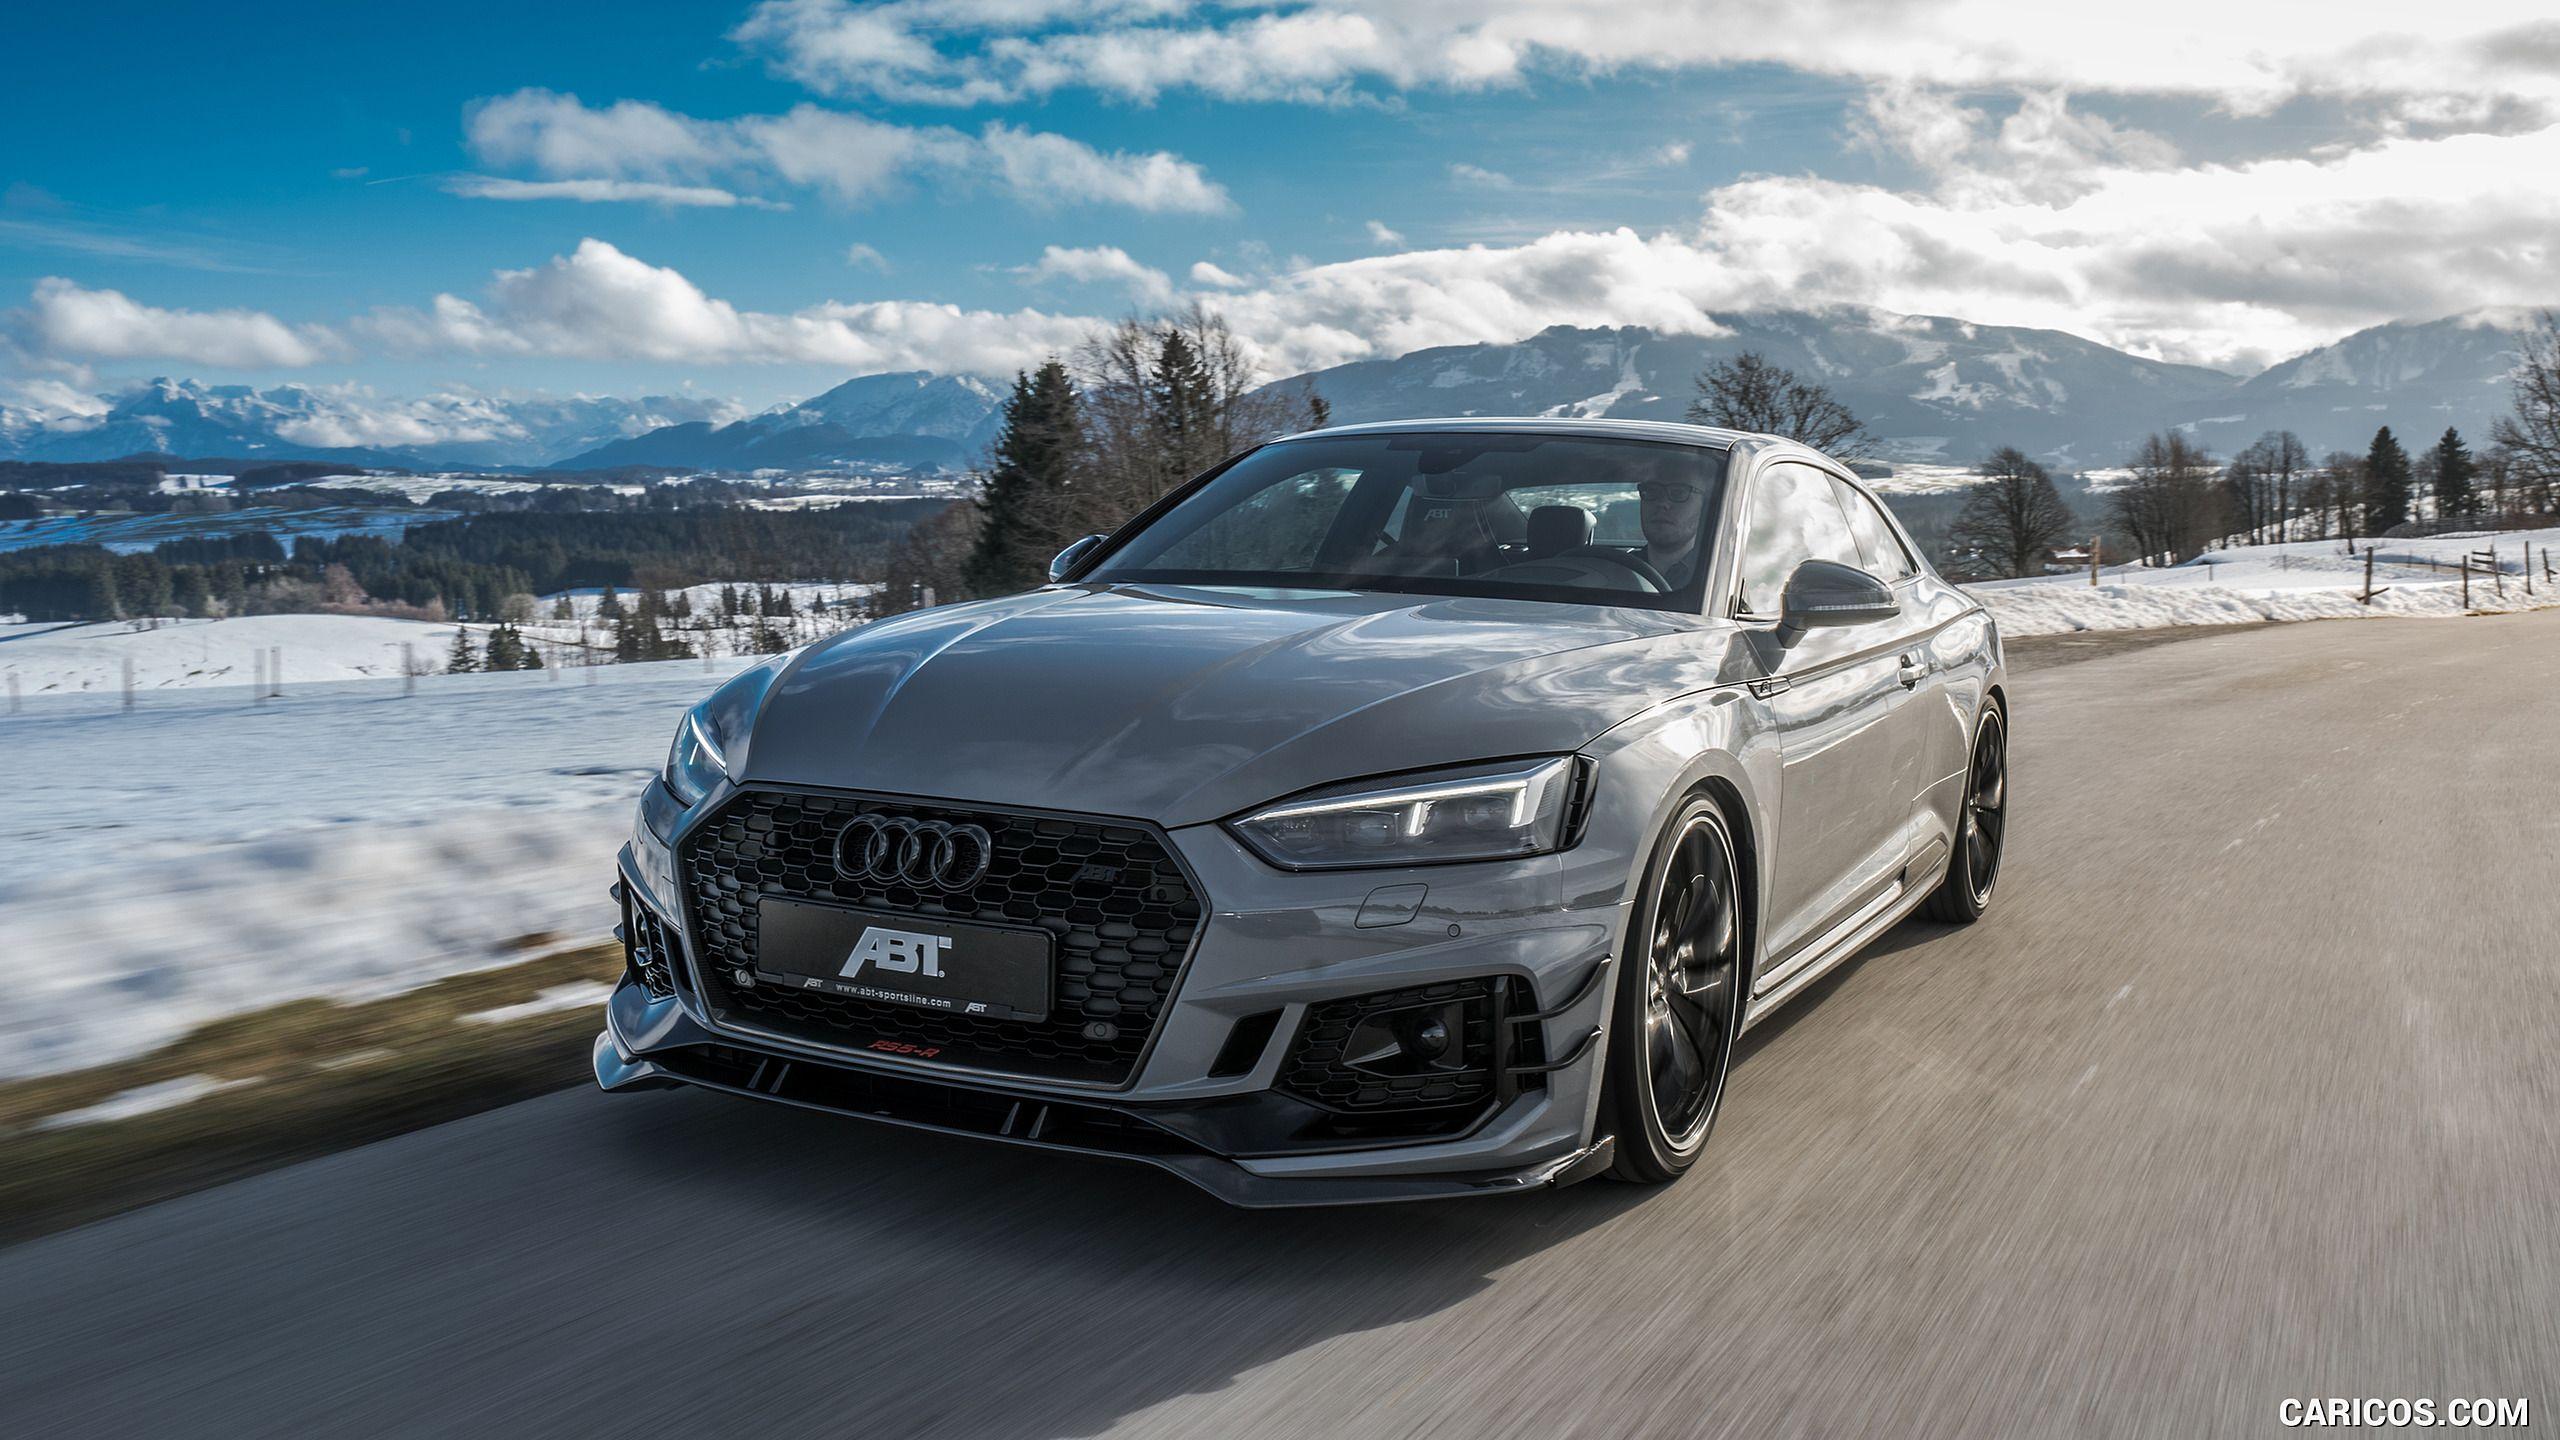 Next Stop Pinterest Audi Audi Rs5 Audi Cars